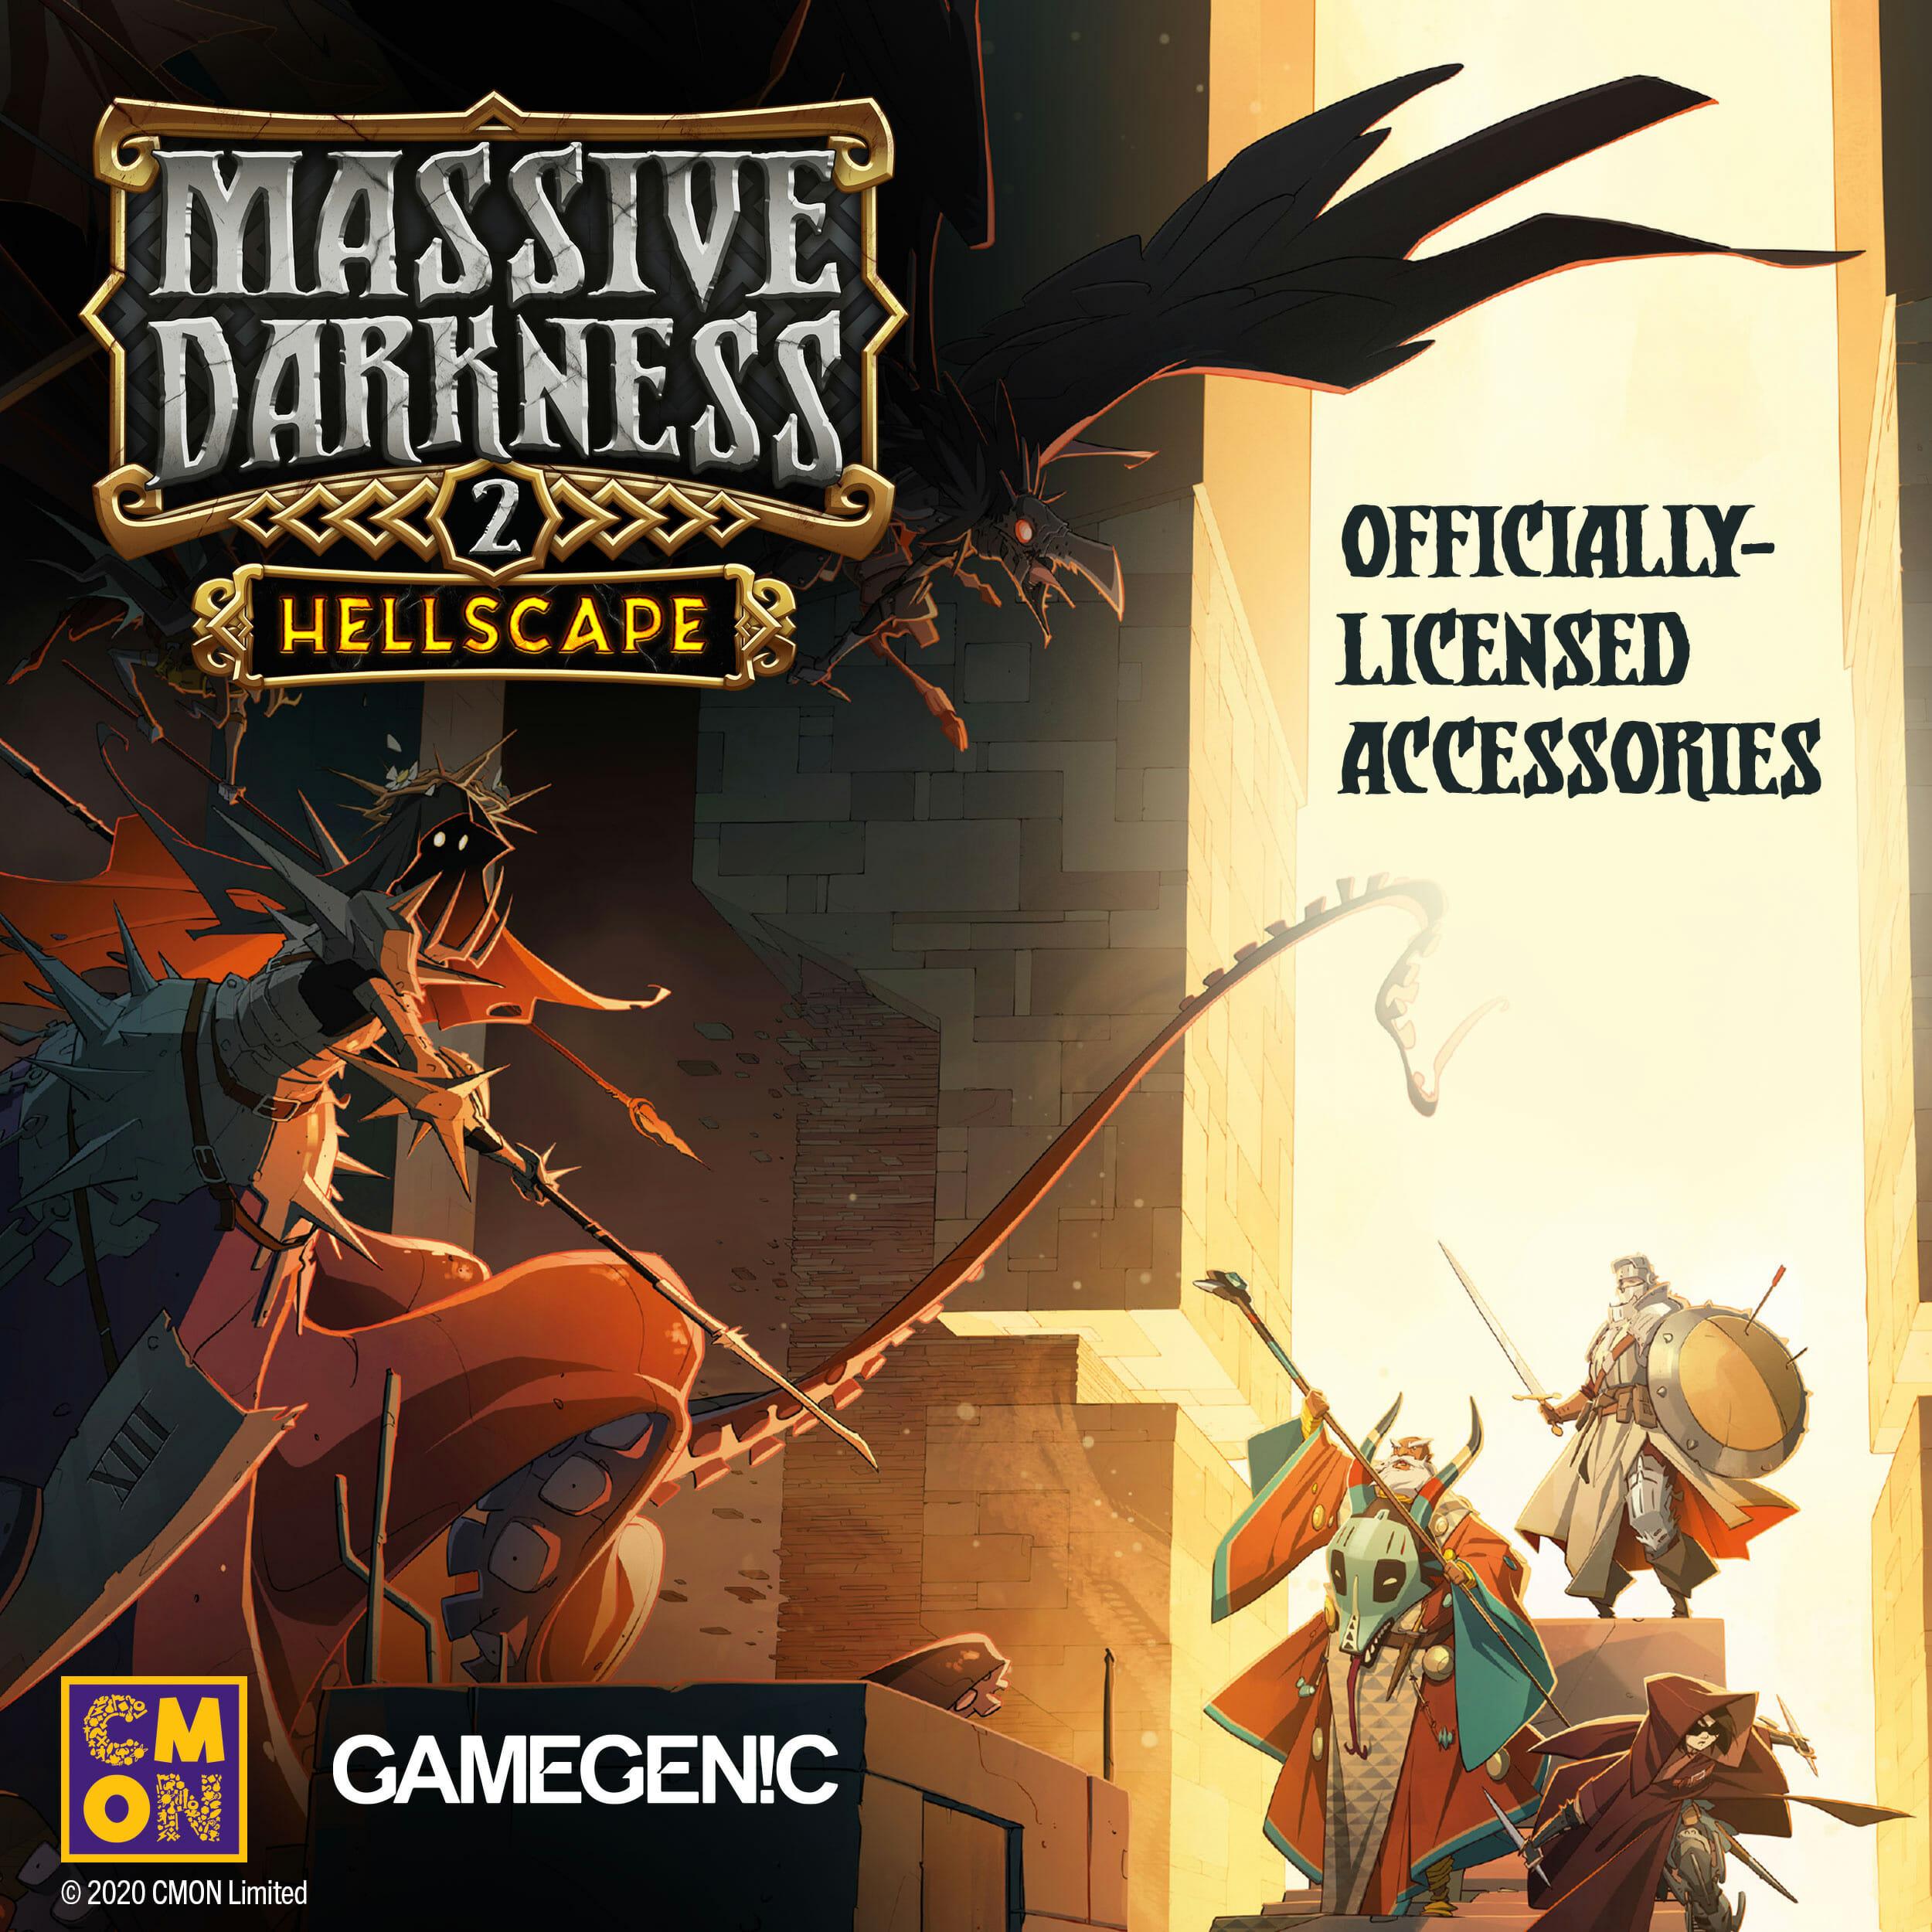 Massive Darkness 2: Hellscape